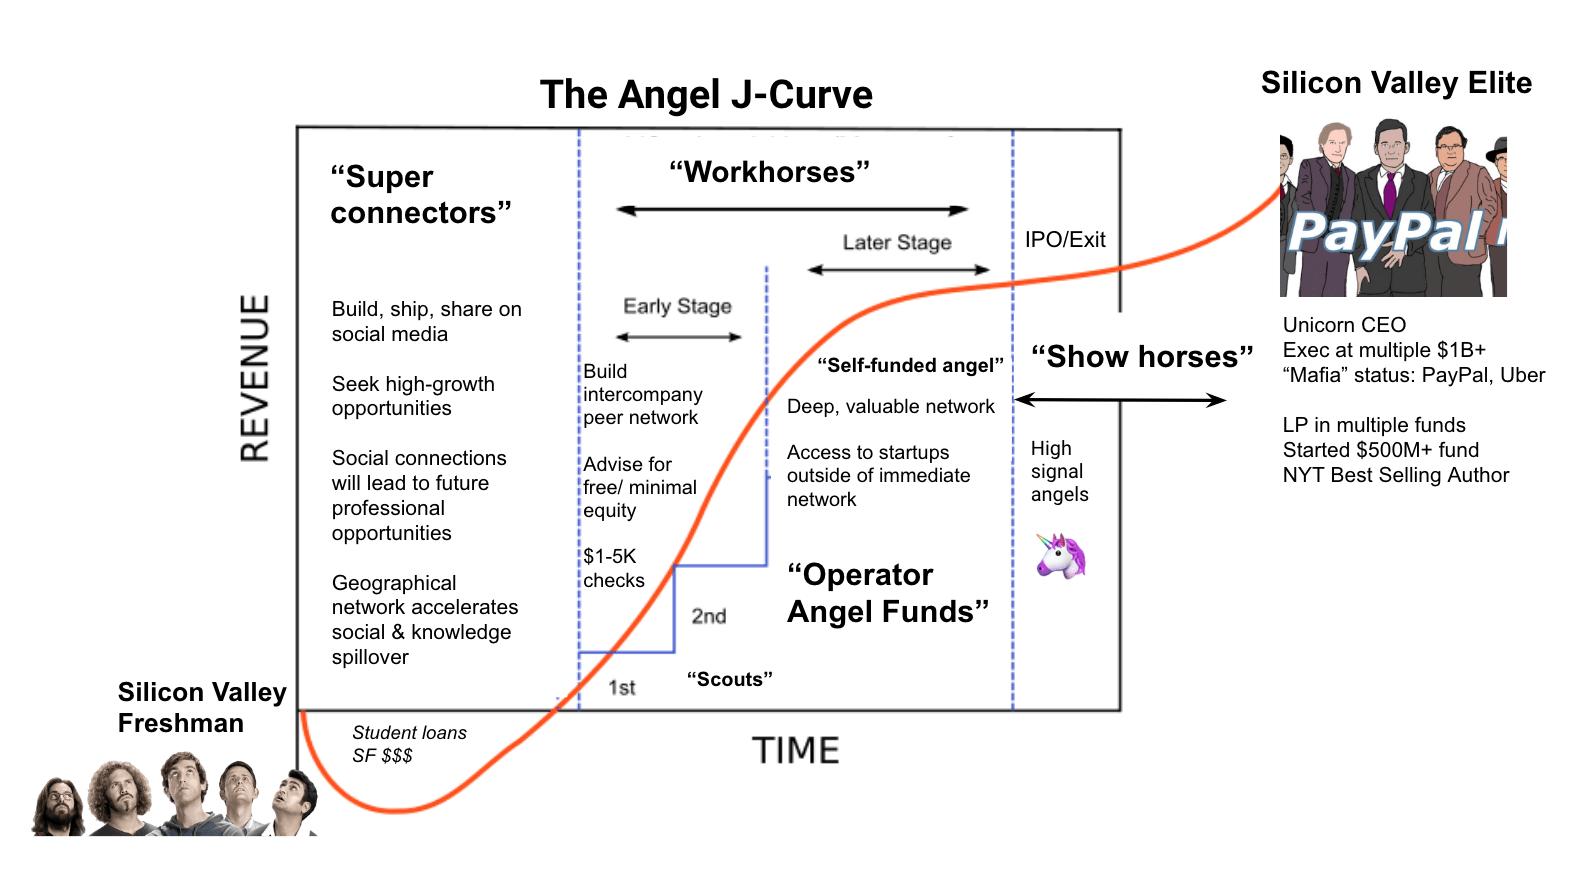 The Angel J-Curve chart